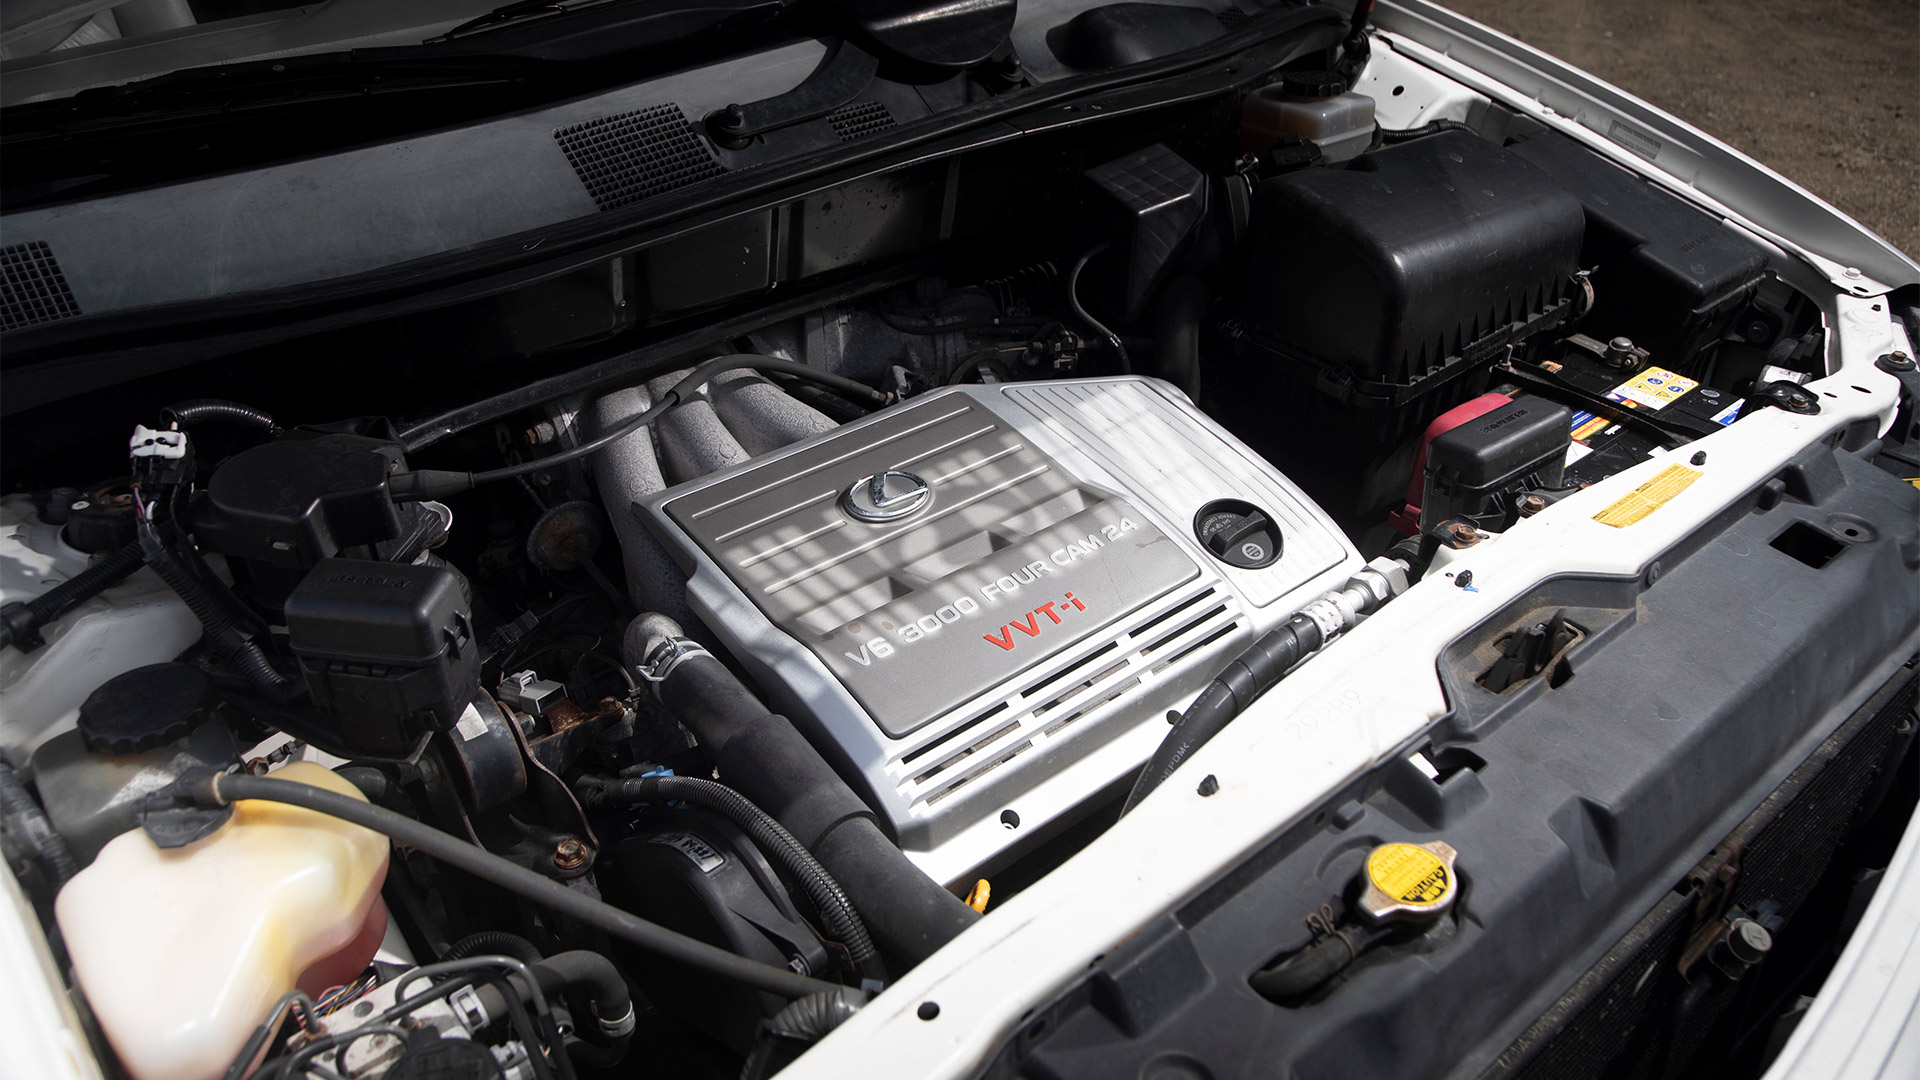 14 2019 020 Lexus RX pionier 1920x1080 galerij